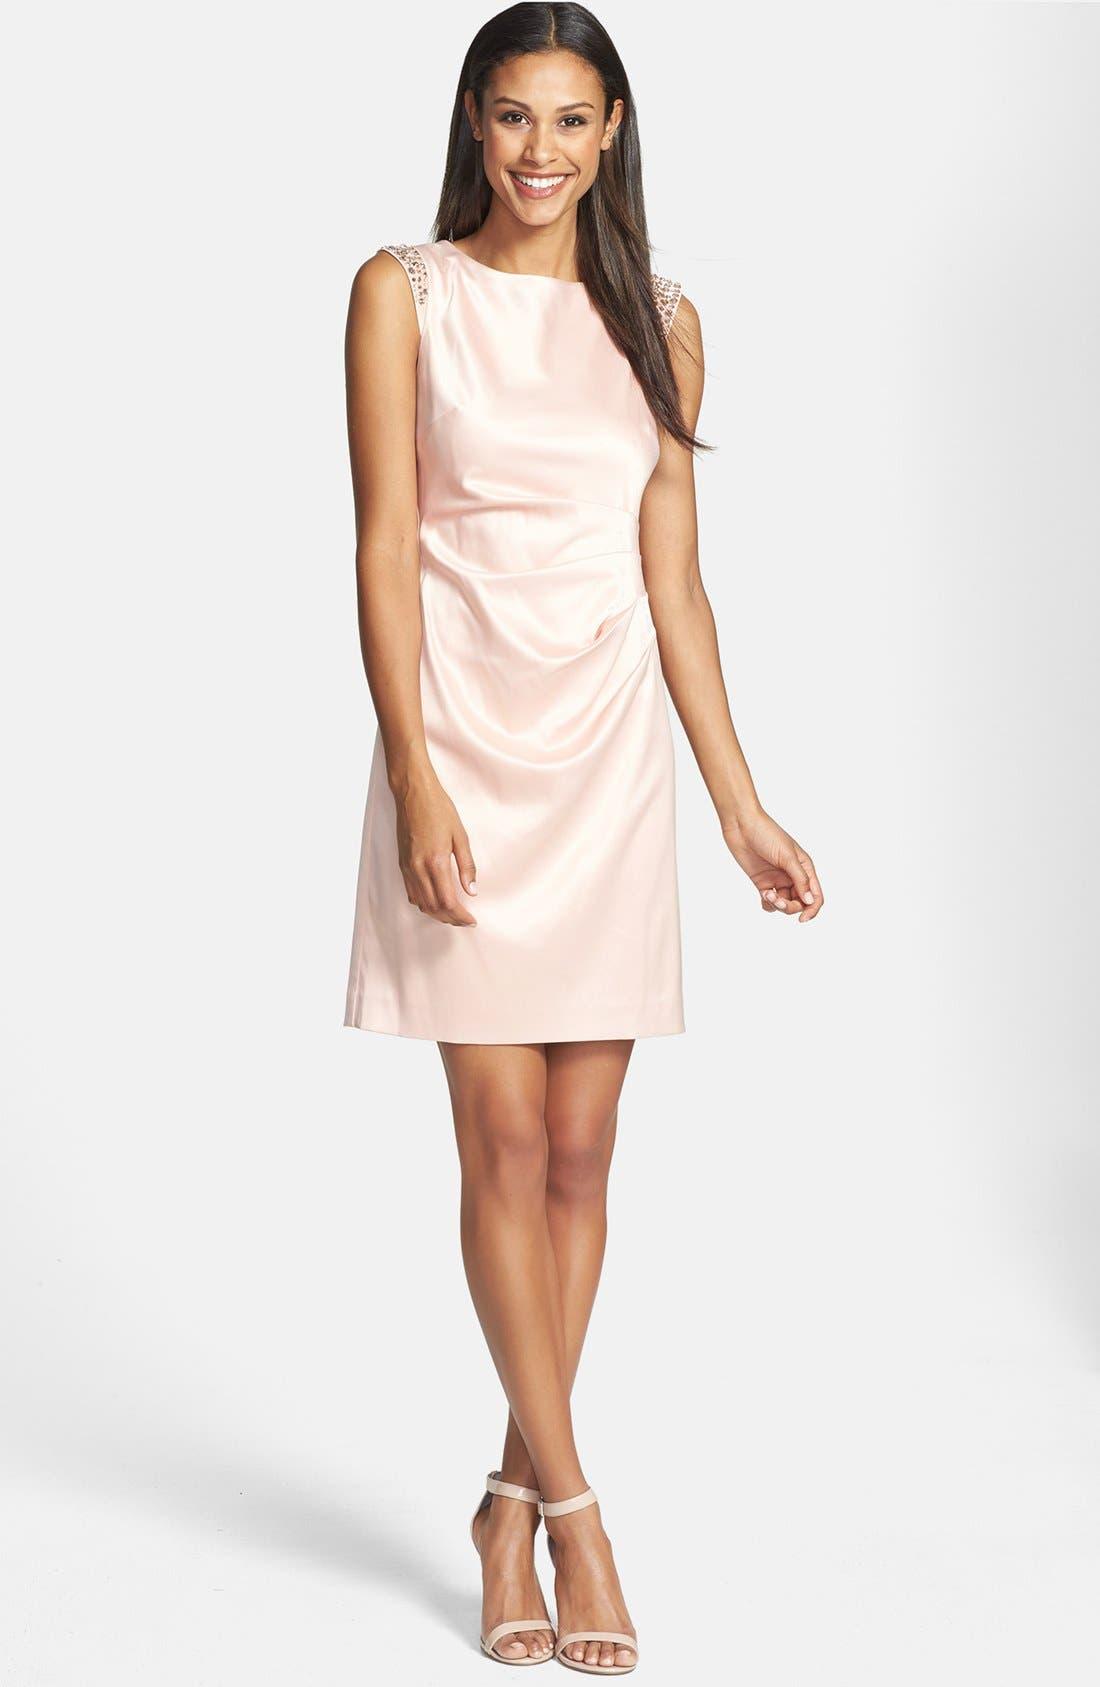 Alternate Image 1 Selected - Vince Camuto Rhinestone Embellished Stretch Satin Sheath Dress